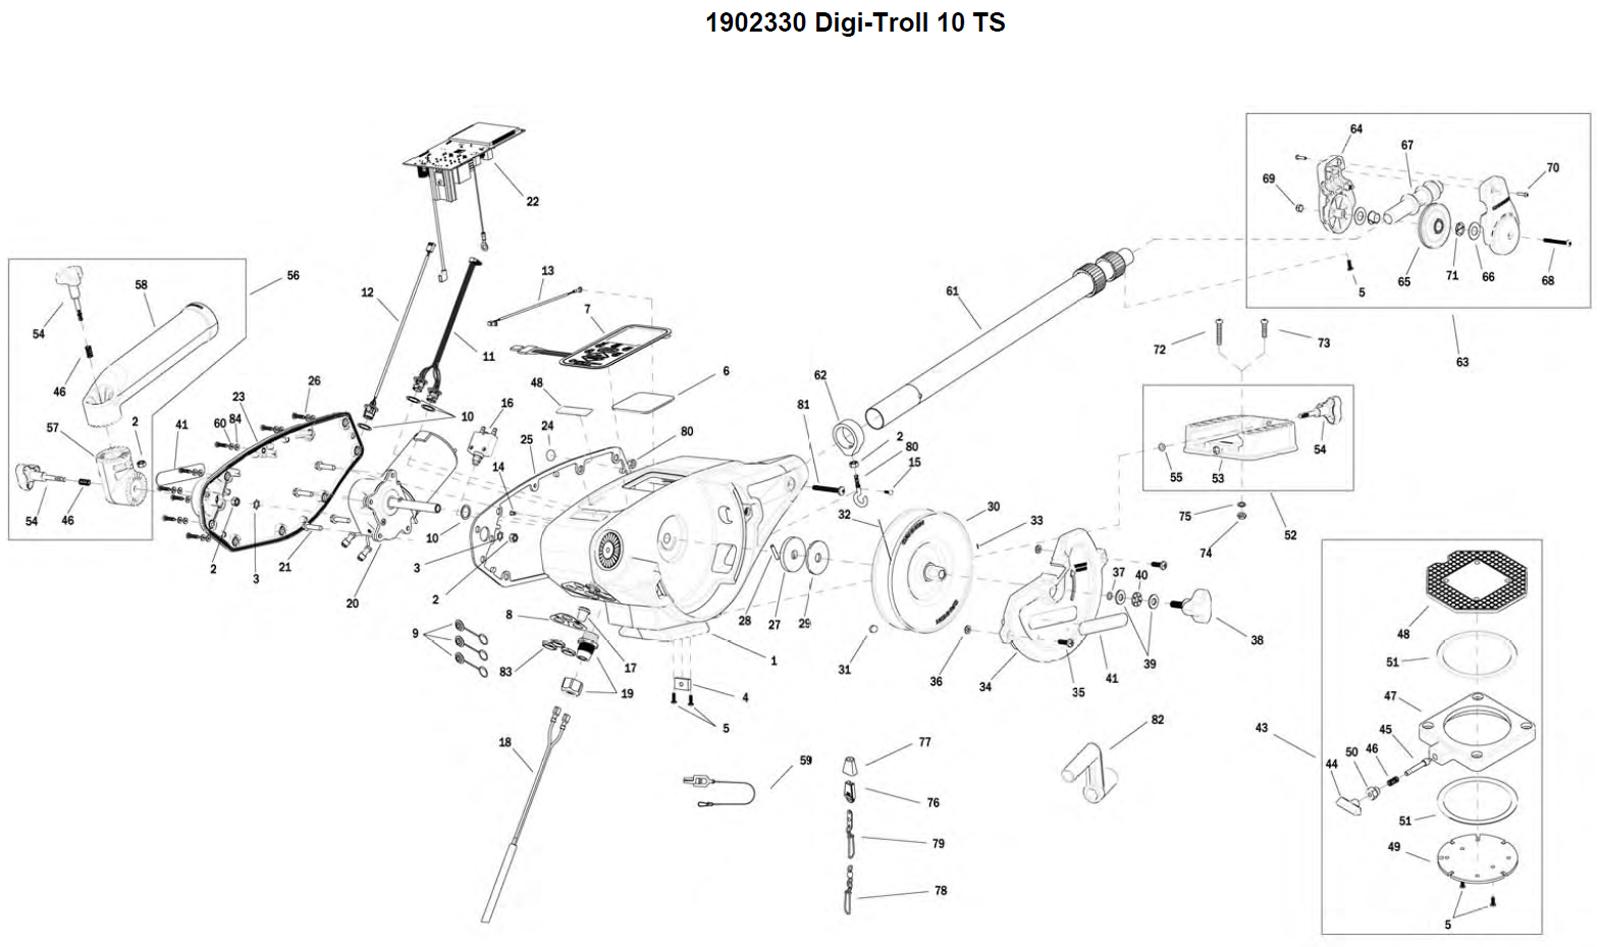 Cannon Downrigger Parts : Order cannon digi troll ts electric downrigger parts